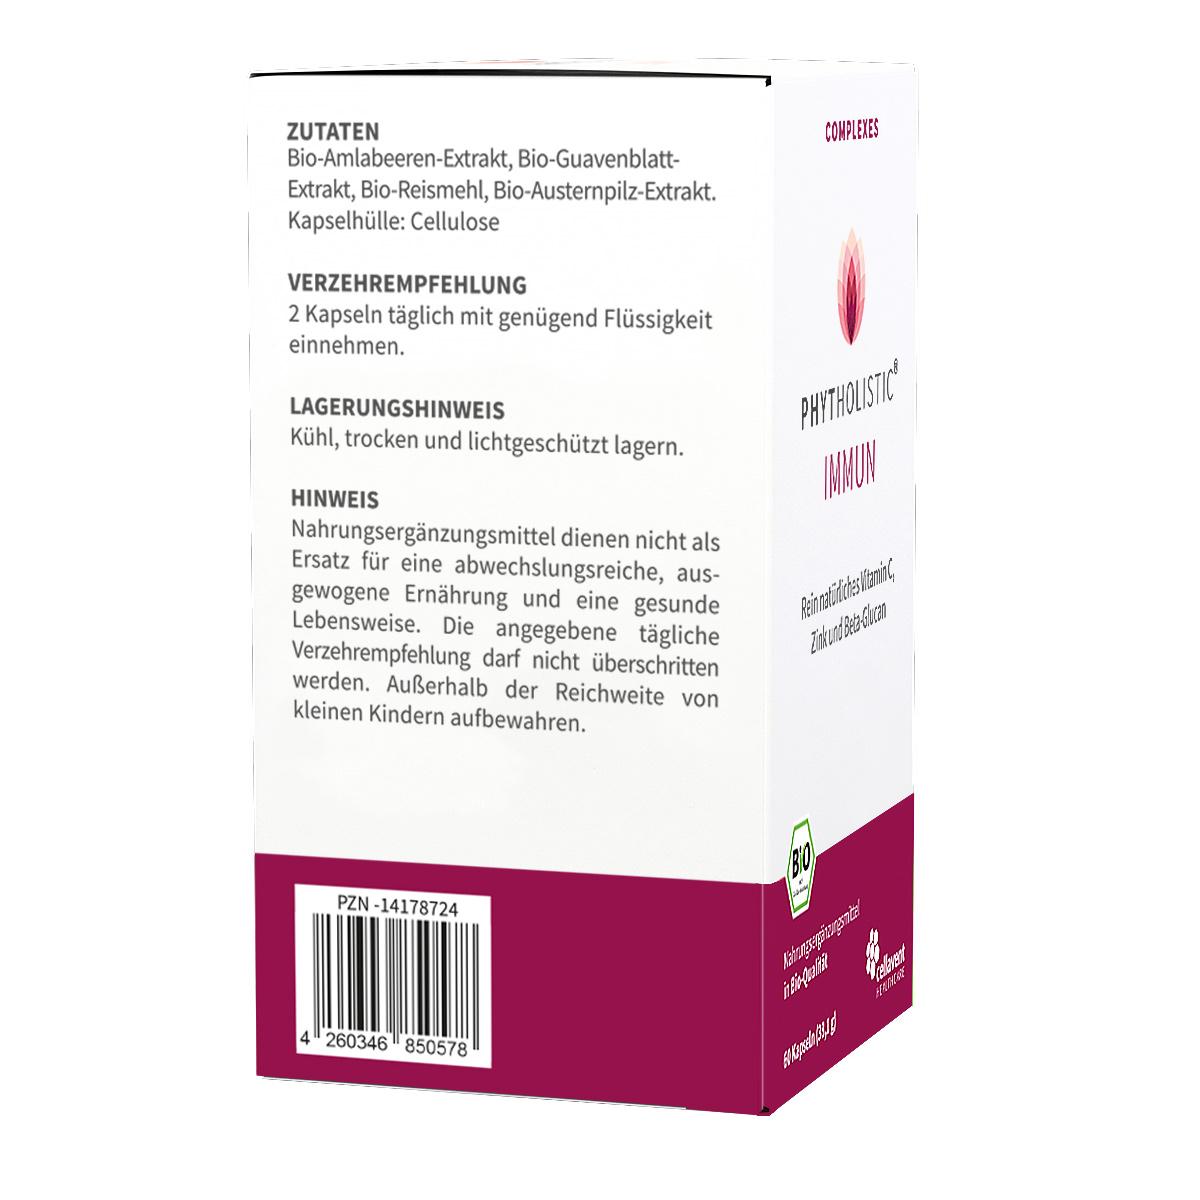 immun-kapseln-bio-rein-pflanzlich-phytholistic-60-stueck-verpackung-links-1200x1200